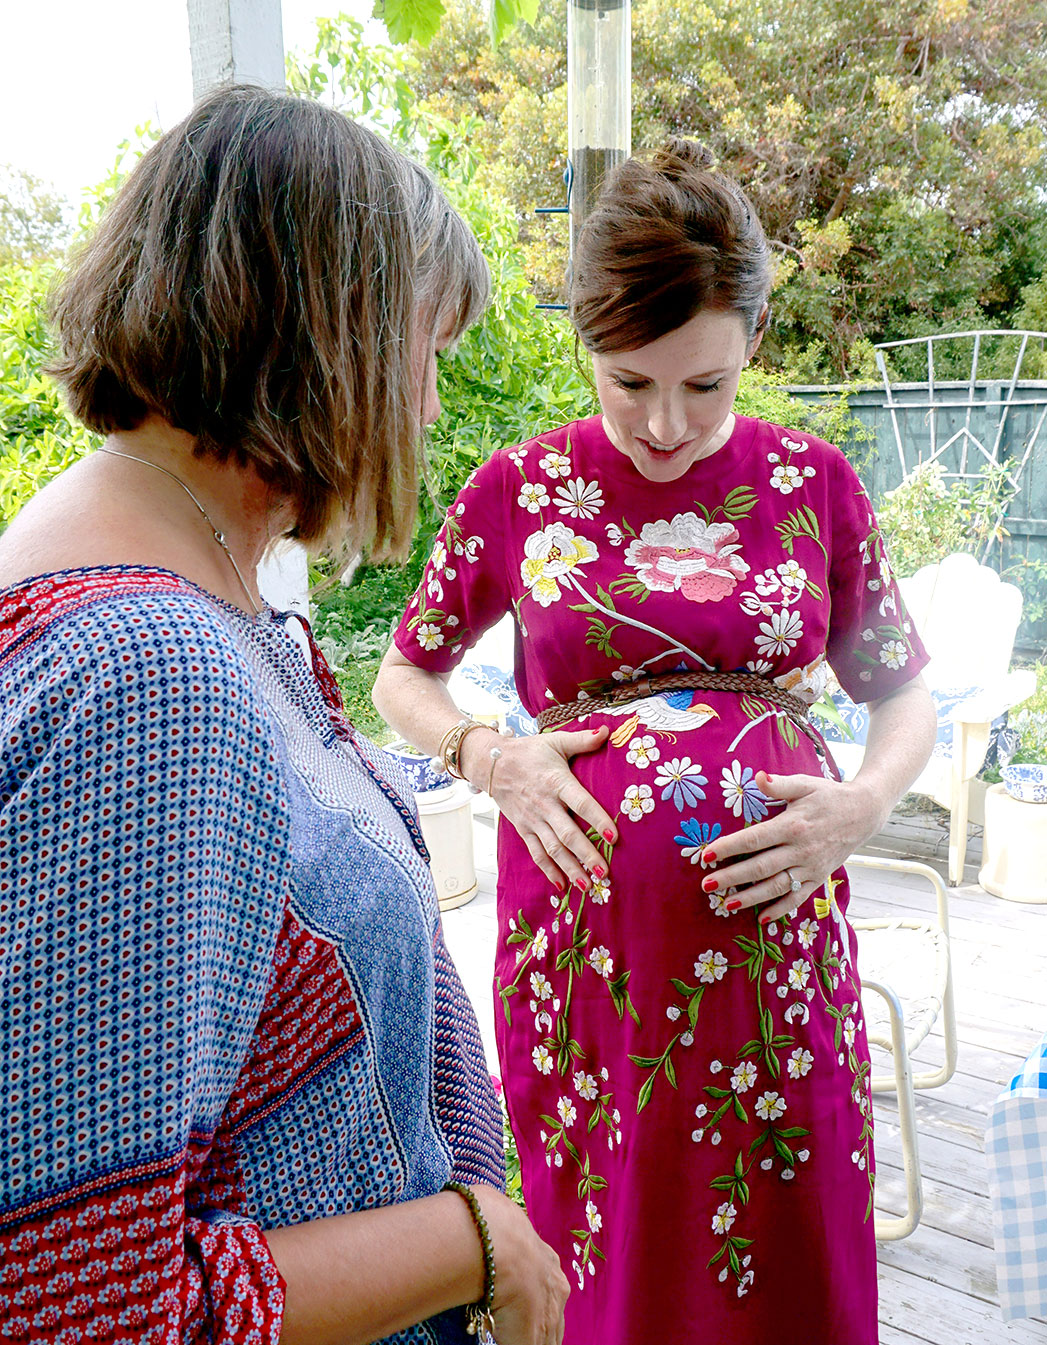 6 months pregnant